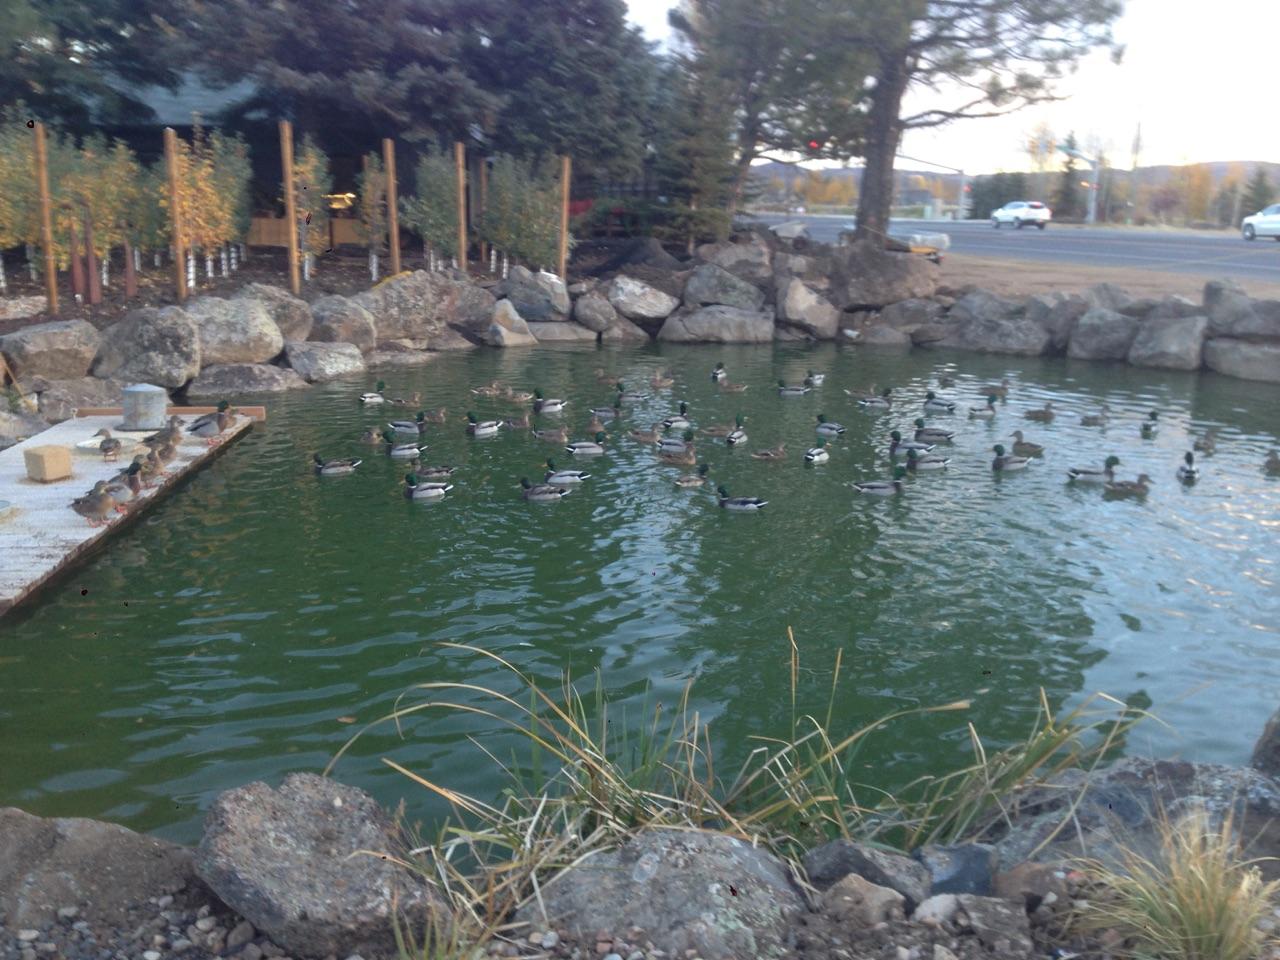 Wild ducks enjoying the BW pond